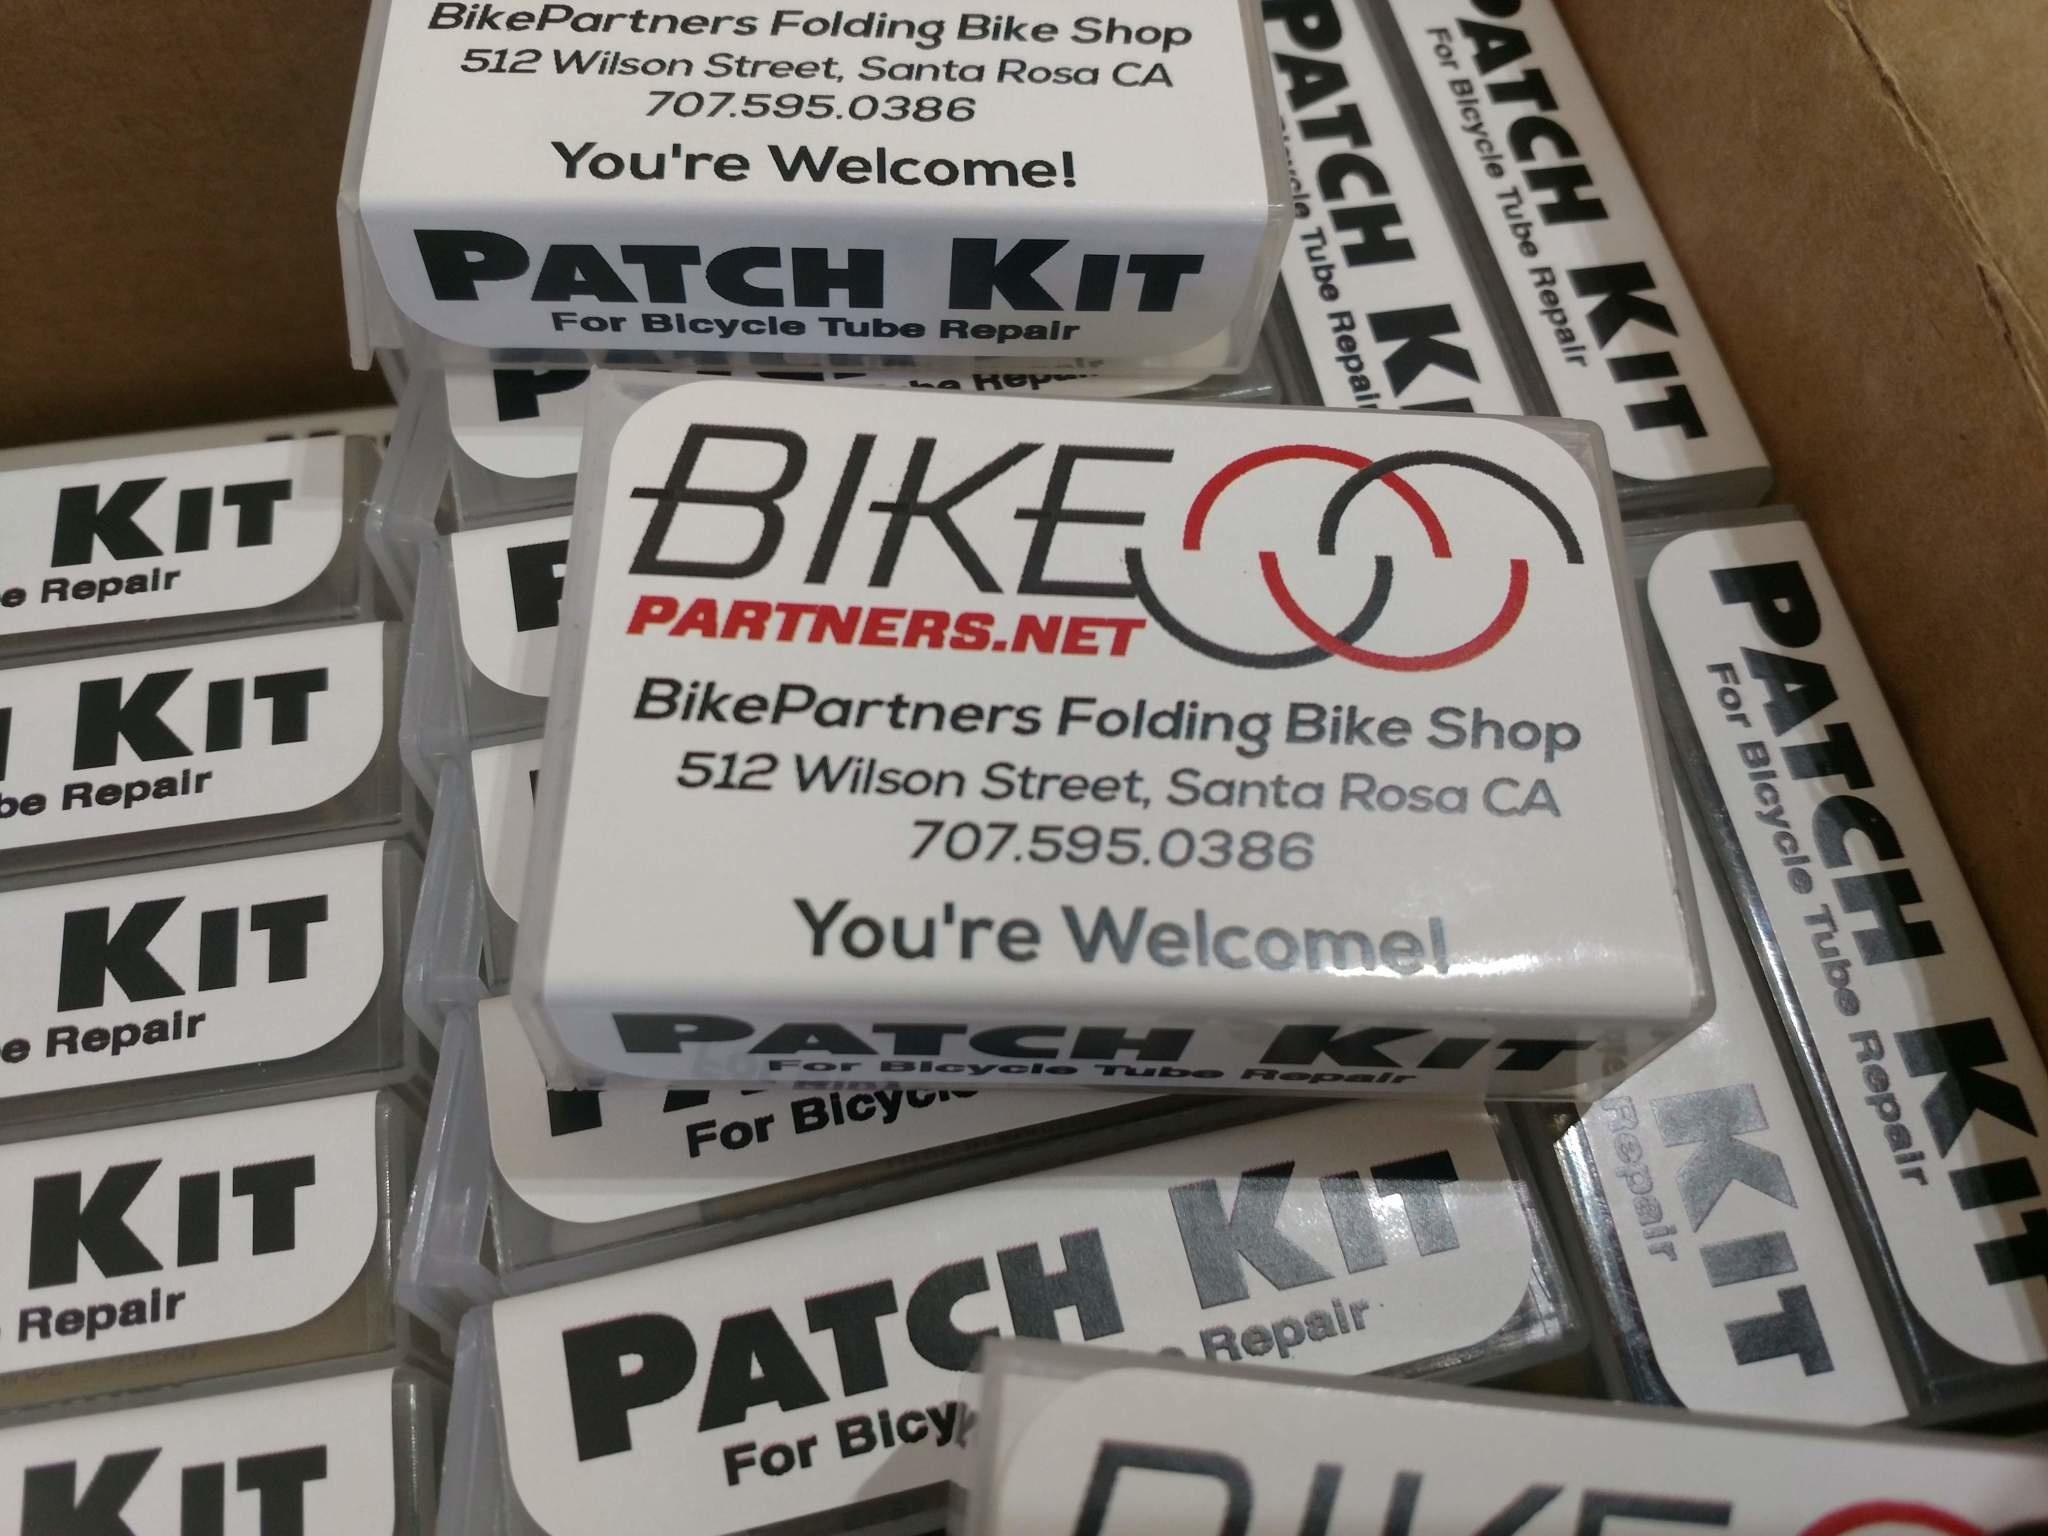 Pro Patch Small Custom Patch Kit, BikePartners branded